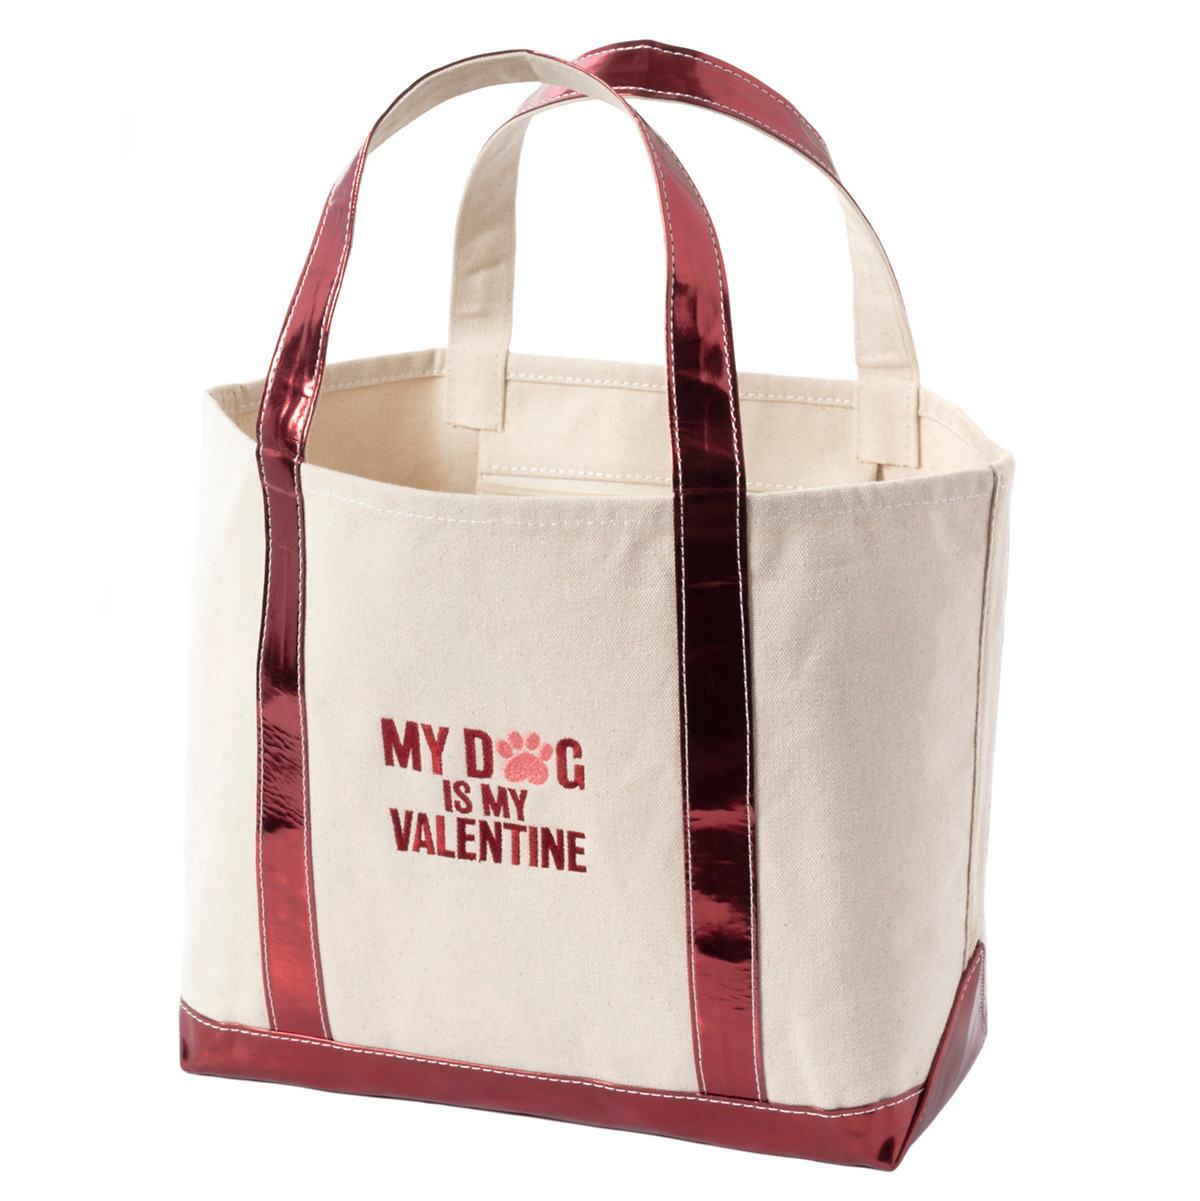 Valentine Glam Canvas Natural/Cranberry Tote Bag